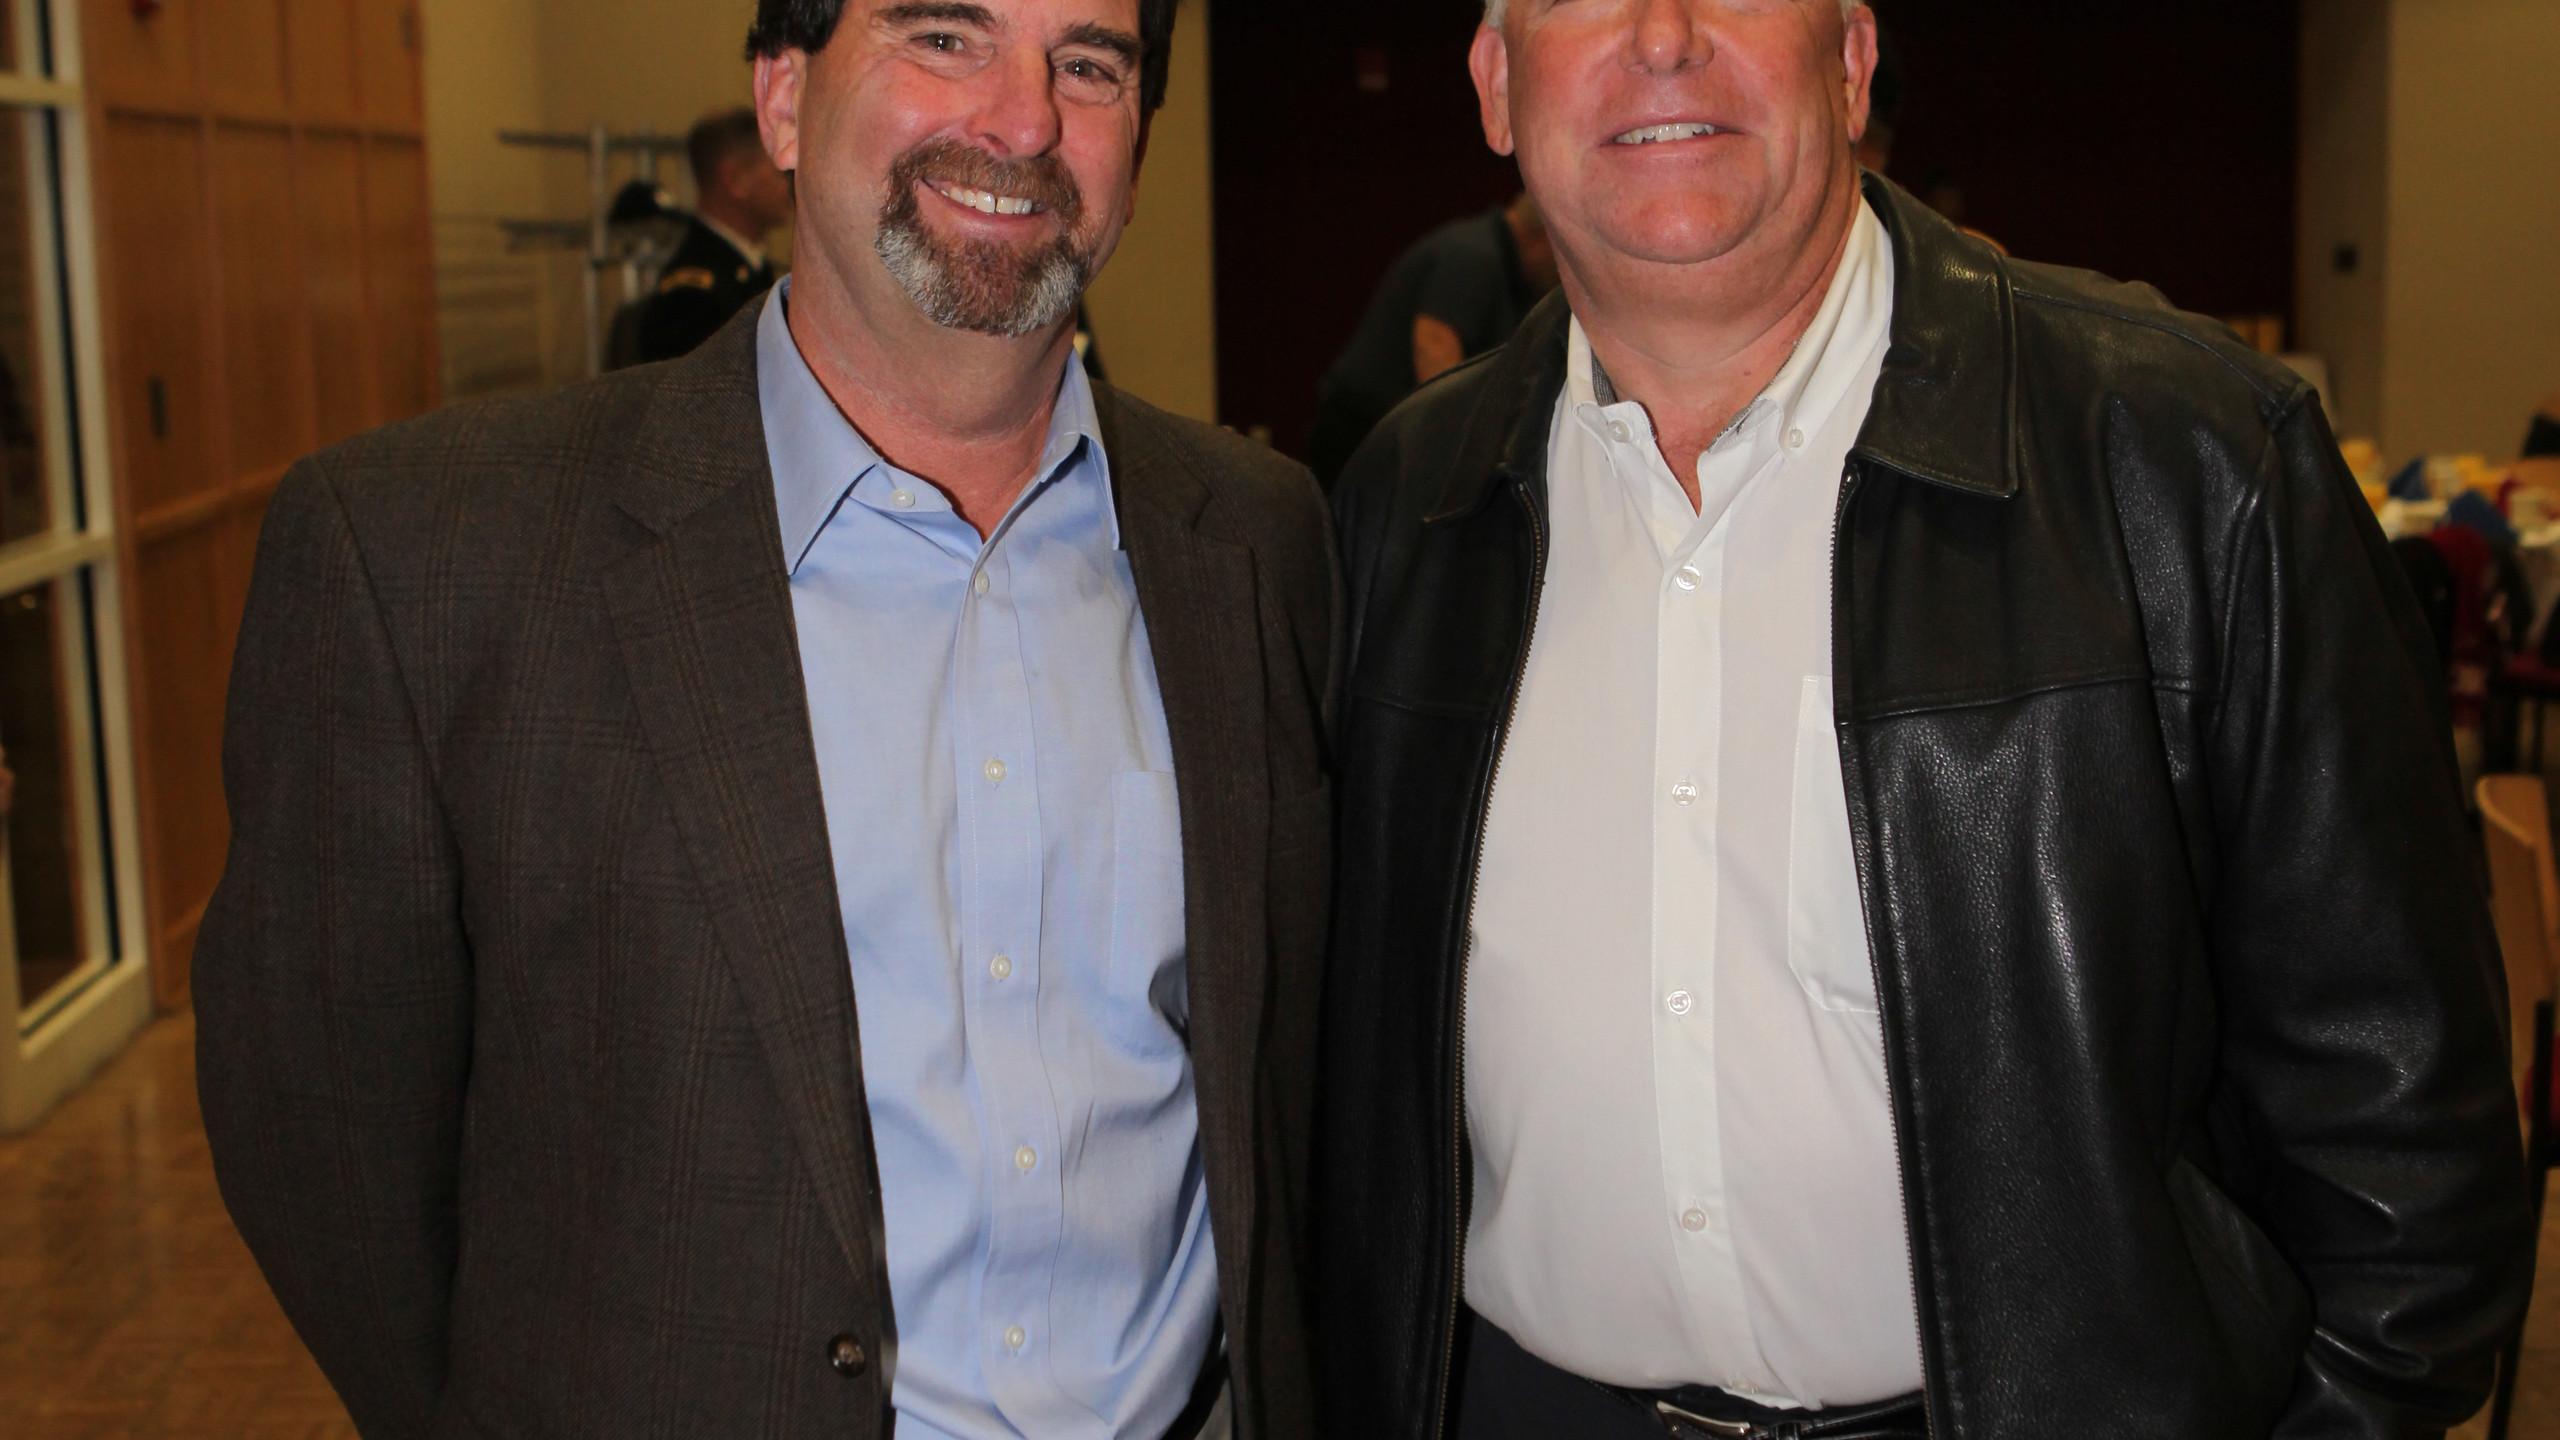 Jeff Burkhart, Todd Harvey